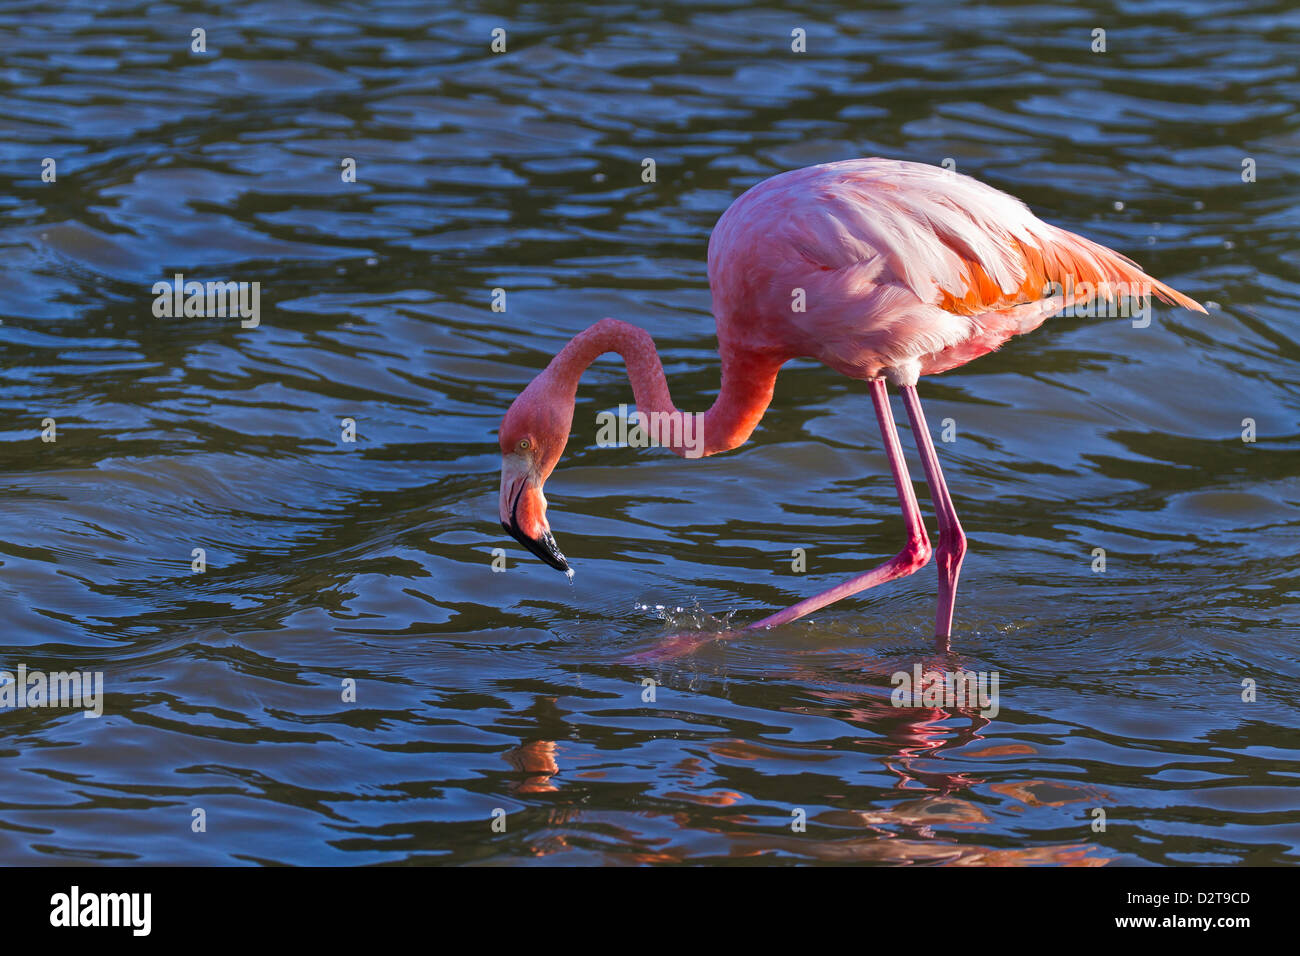 Greater flamingo (Phoenicopterus ruber), Las Bachas, Santa Cruz Island, Galapagos Islands, Ecuador, South America Stock Photo